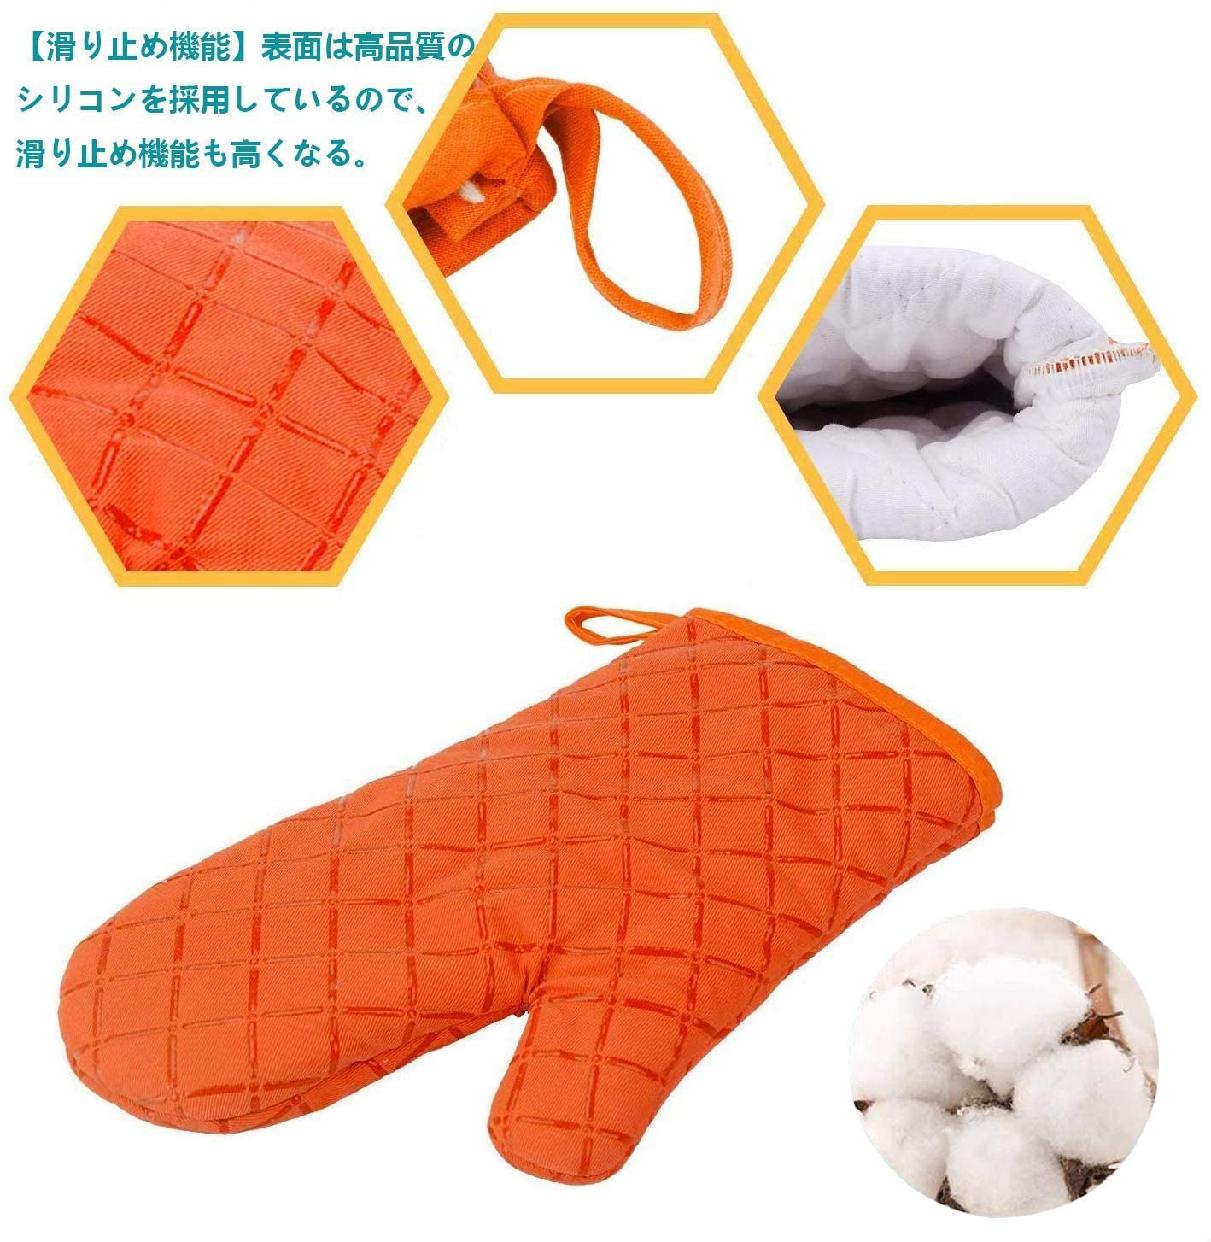 Big Urite(ビッグウライト) 断熱オーブンミトン 2枚セット(オレンジ)の商品画像6